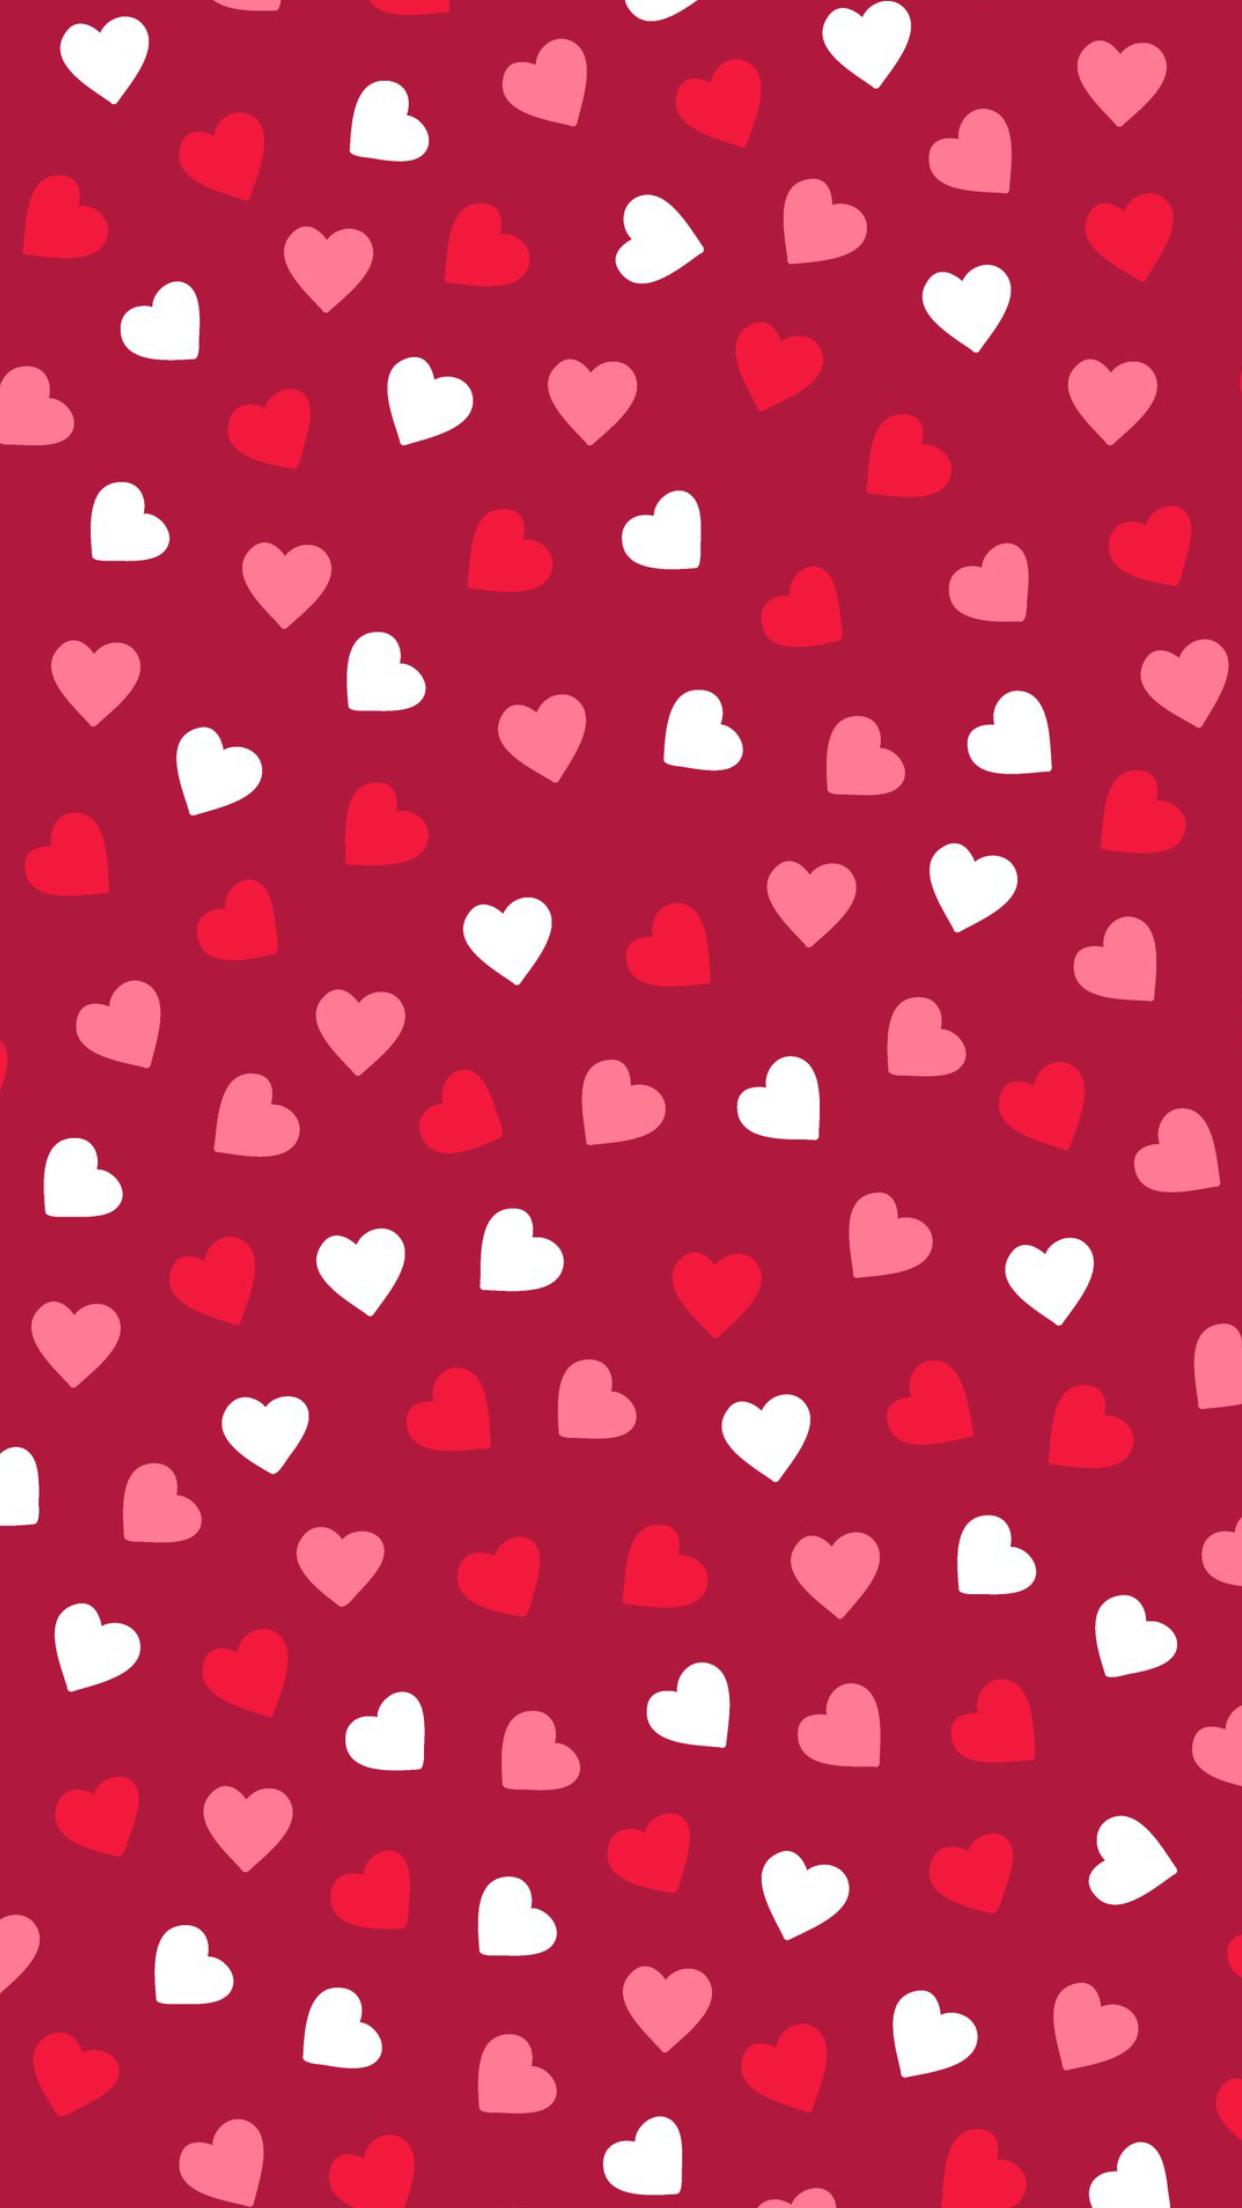 Dp Petite Black Textured Trousers Valentines Wallpaper Heart Wallpaper Holiday Wallpaper